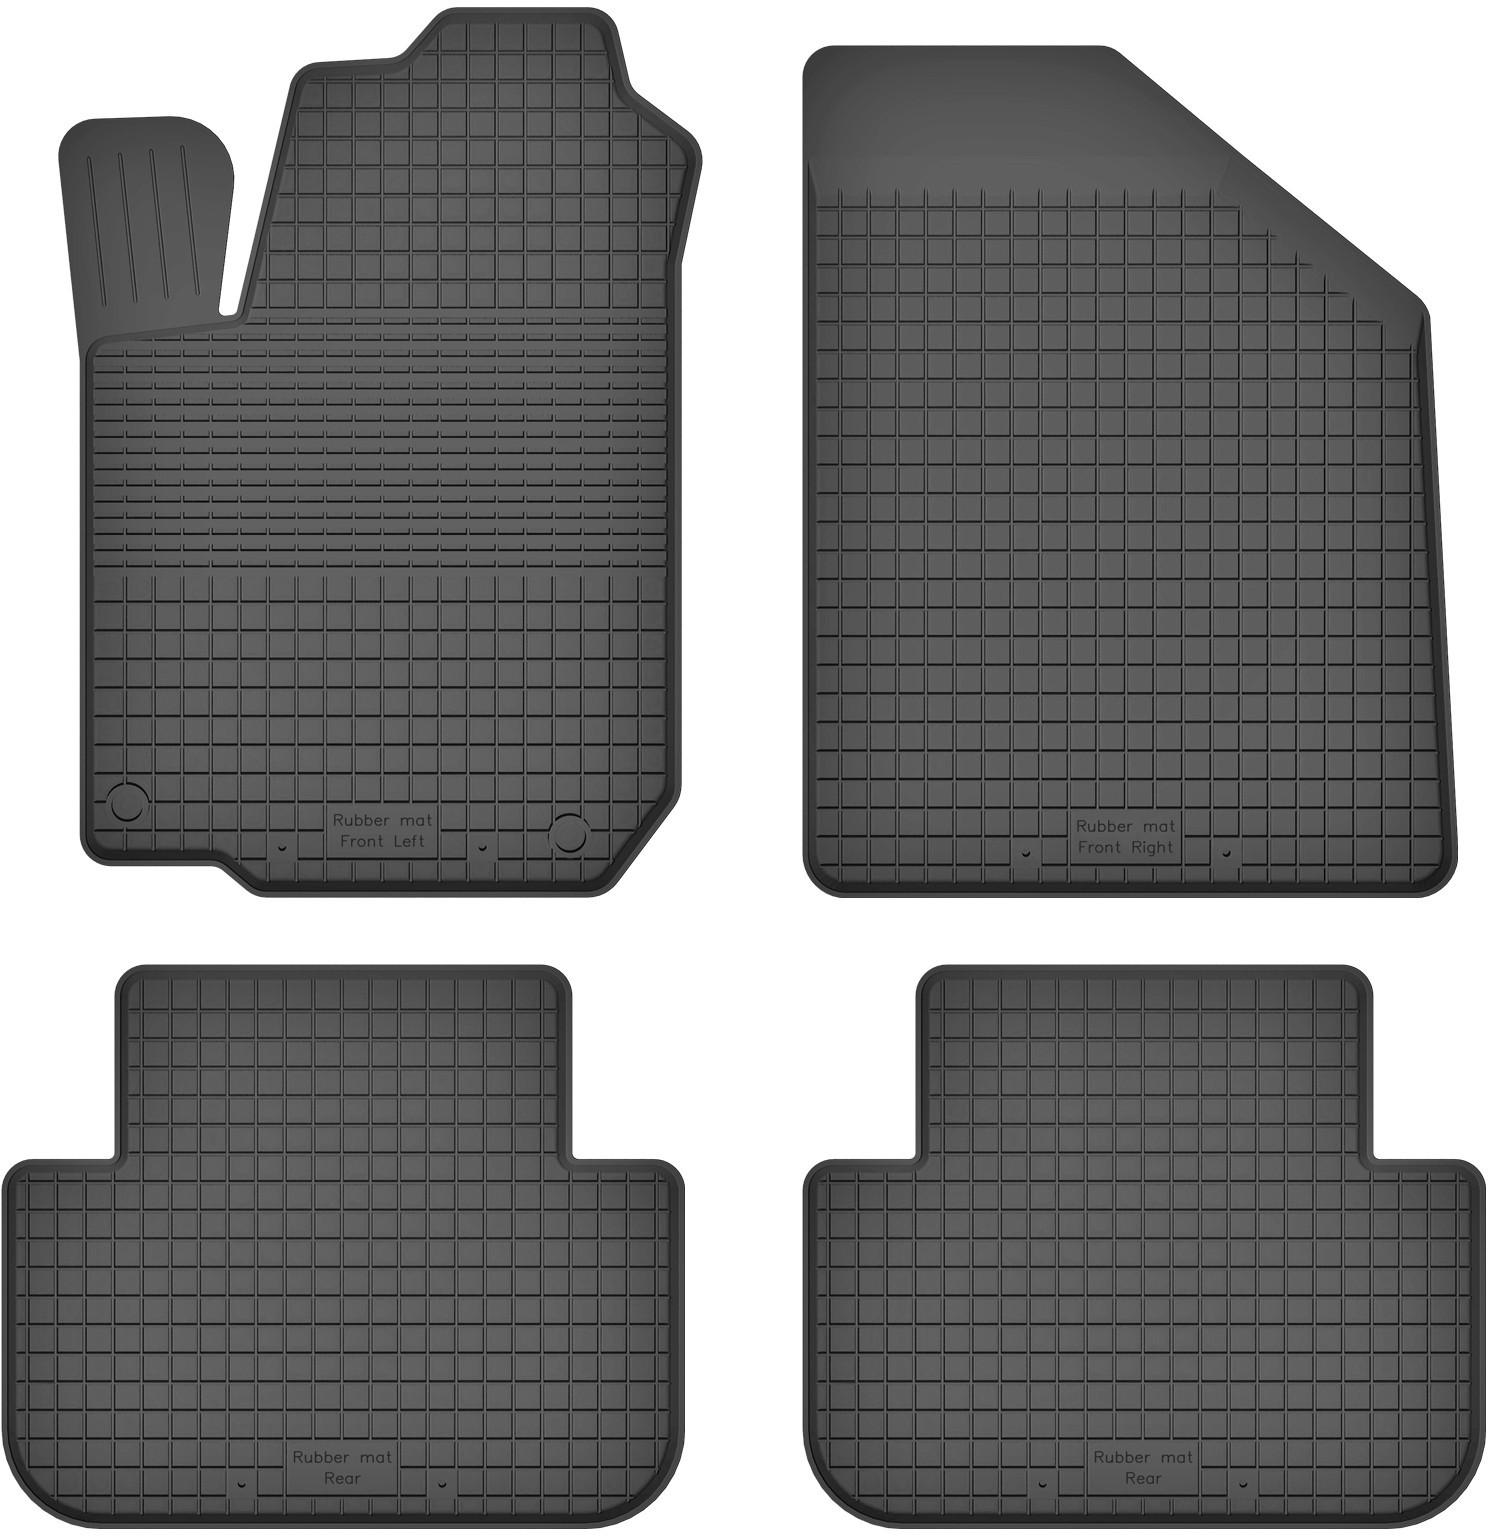 MotoHobby Peugeot Partner II (od 2008) -dywaniki gumowe korytkowe